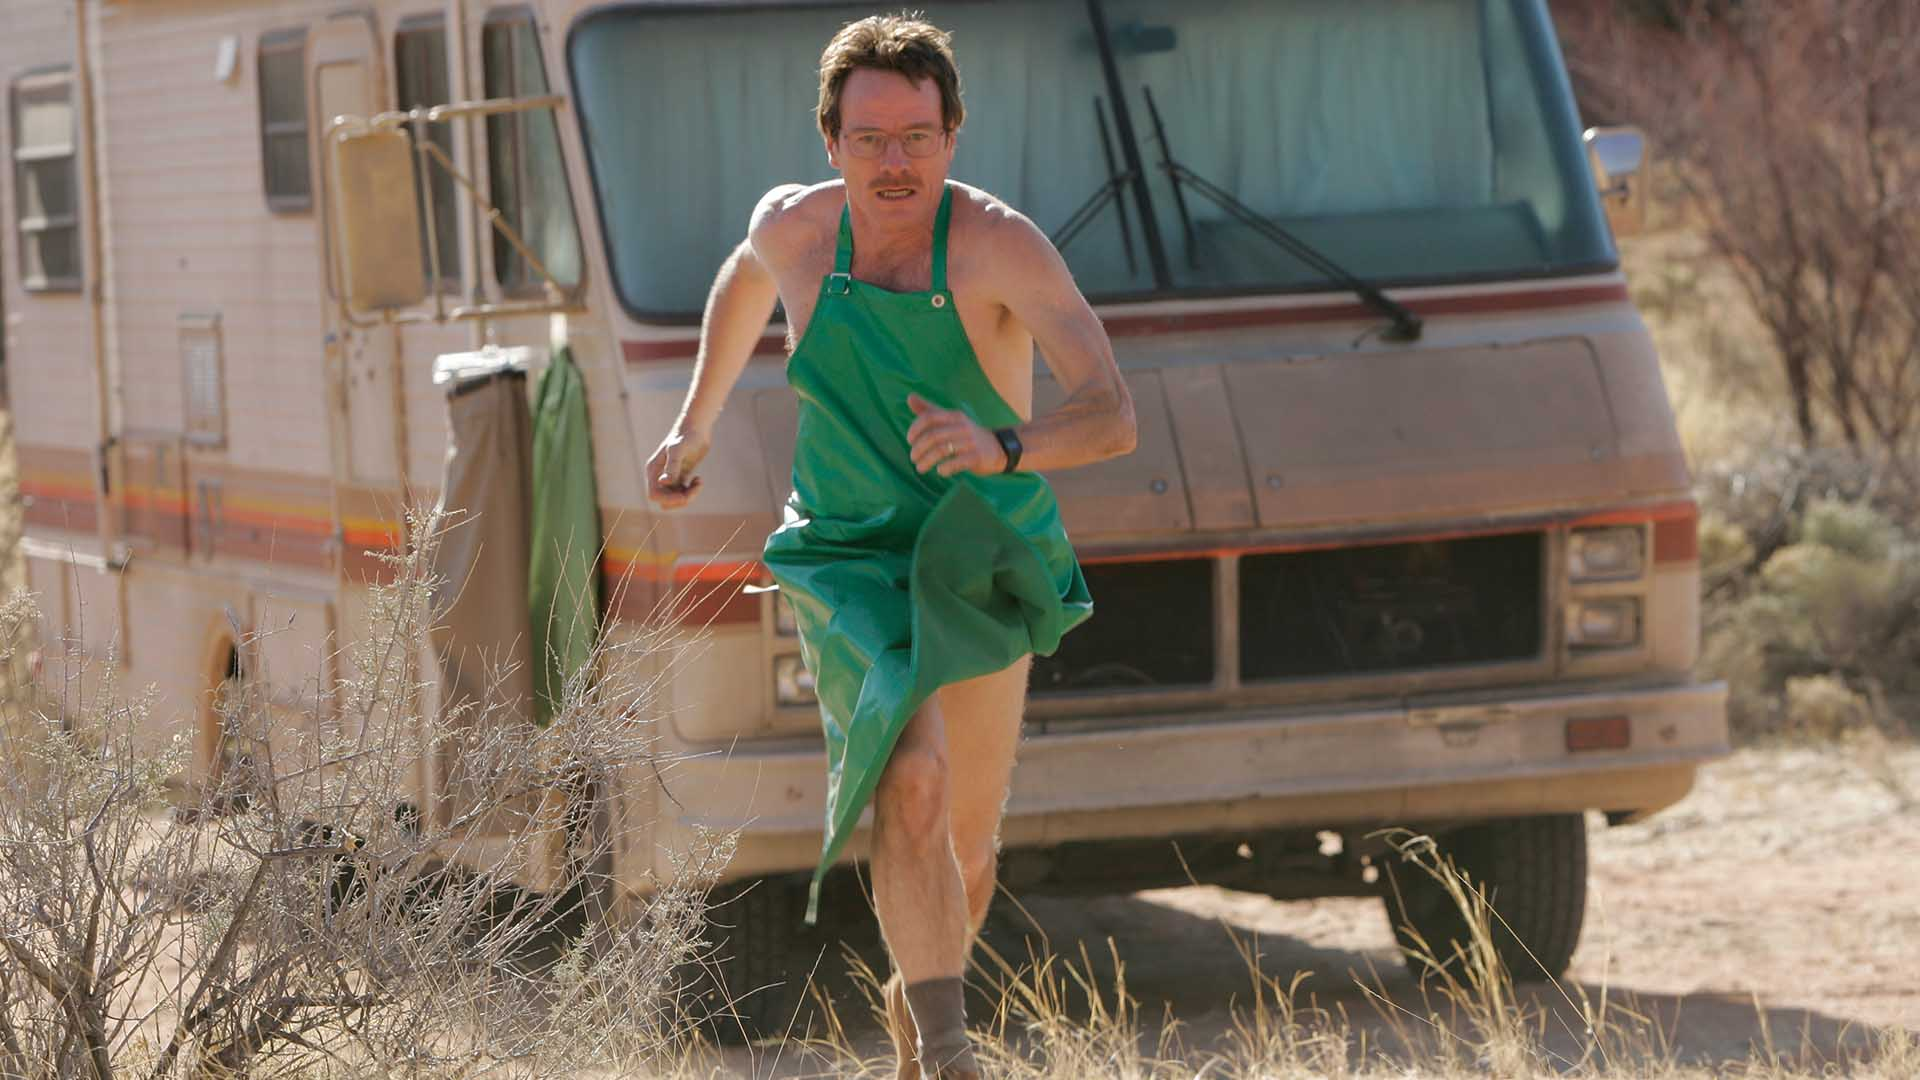 Walter white green apron - Video Extra Breaking Bad Highlights Episode 101 Breaking Bad Pilot Amc